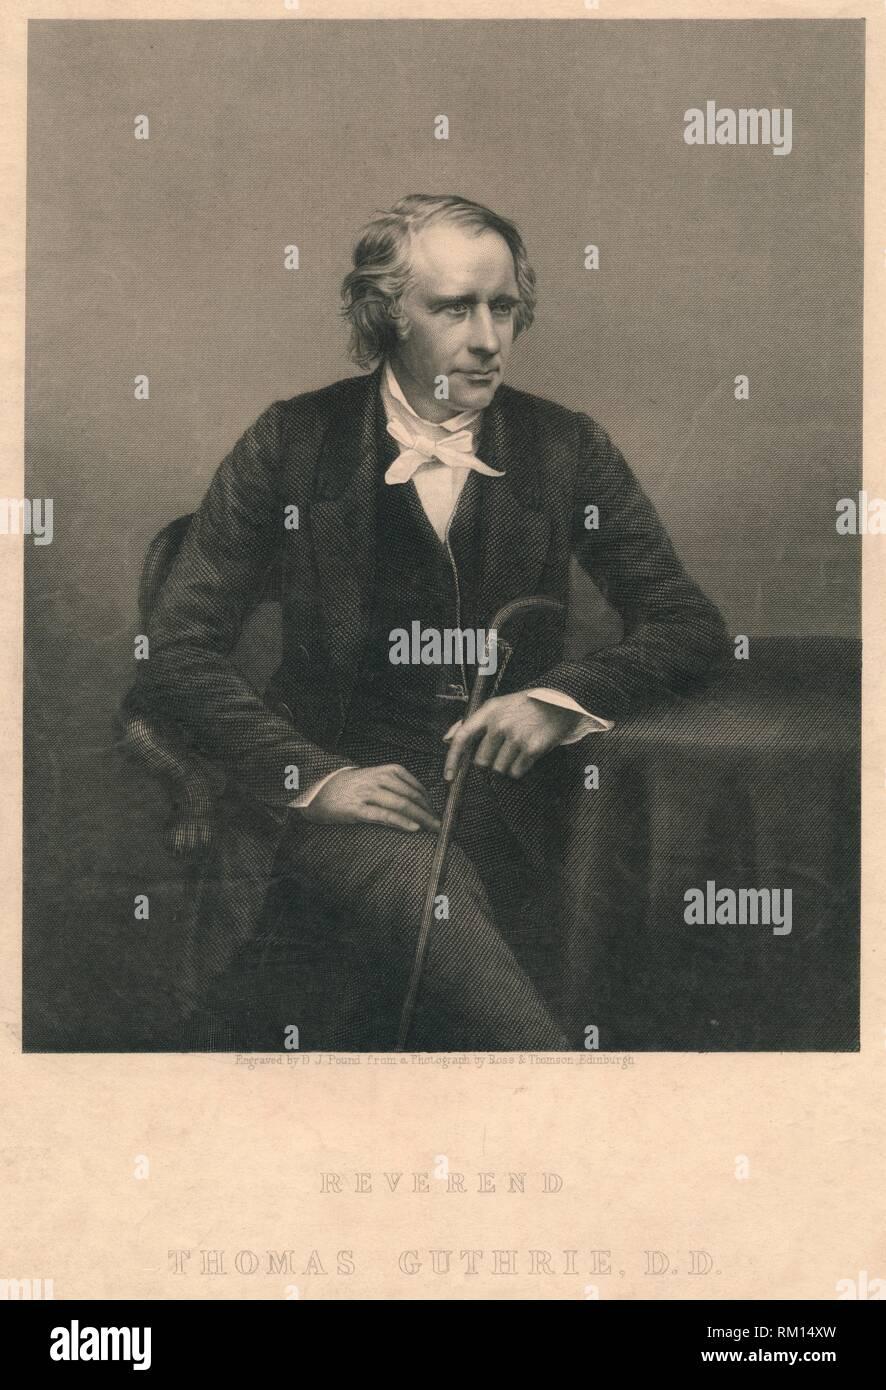 'Reverend Thomas Guthrie, D.D.', 1850s. Creators: Daniel John Pound, Ross and Thompson. - Stock Image